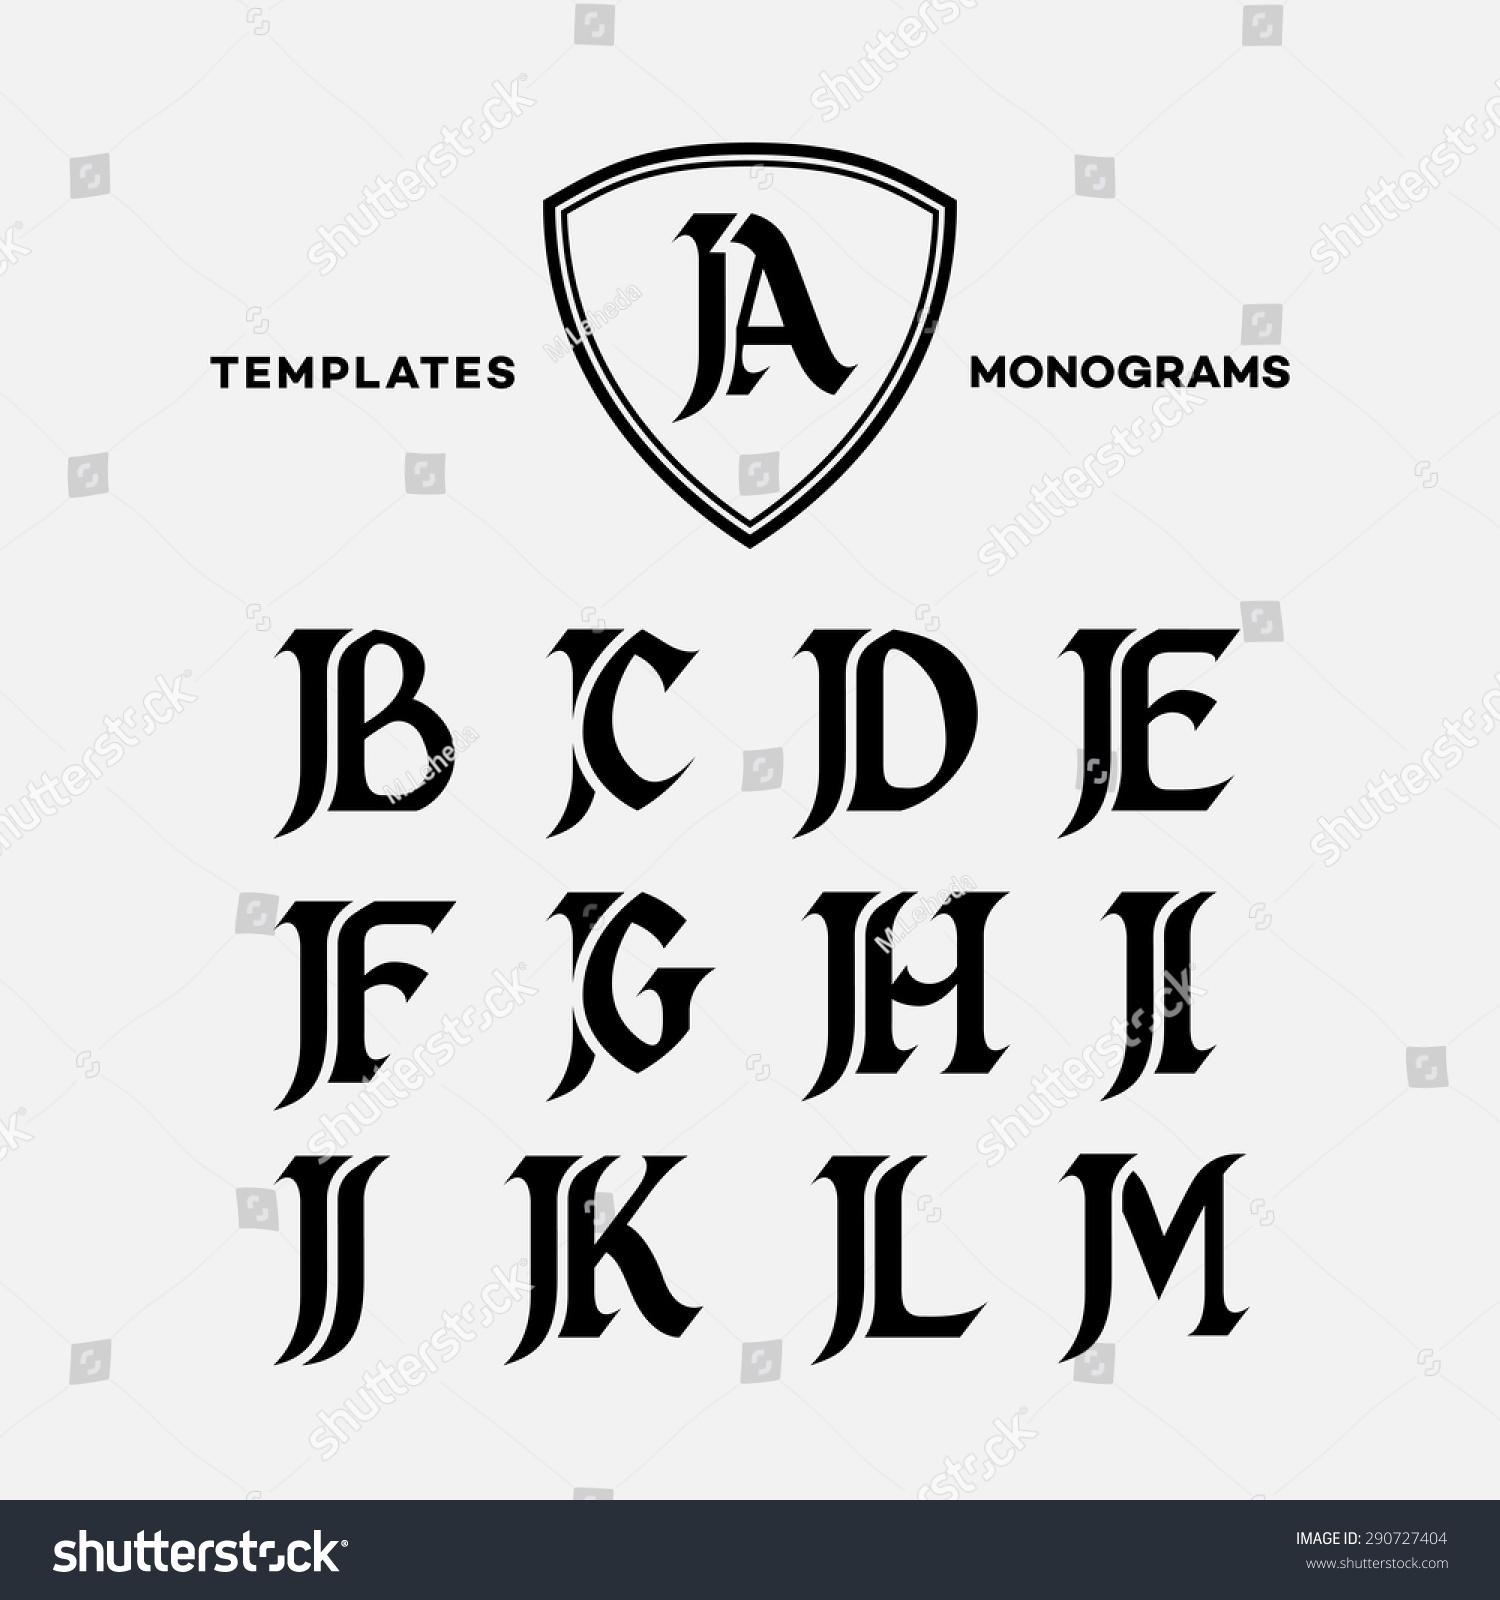 Monogram design template combinations capital letters stock vector monogram design template with combinations of capital letters ja jb jc jd je jf jg jh spiritdancerdesigns Choice Image